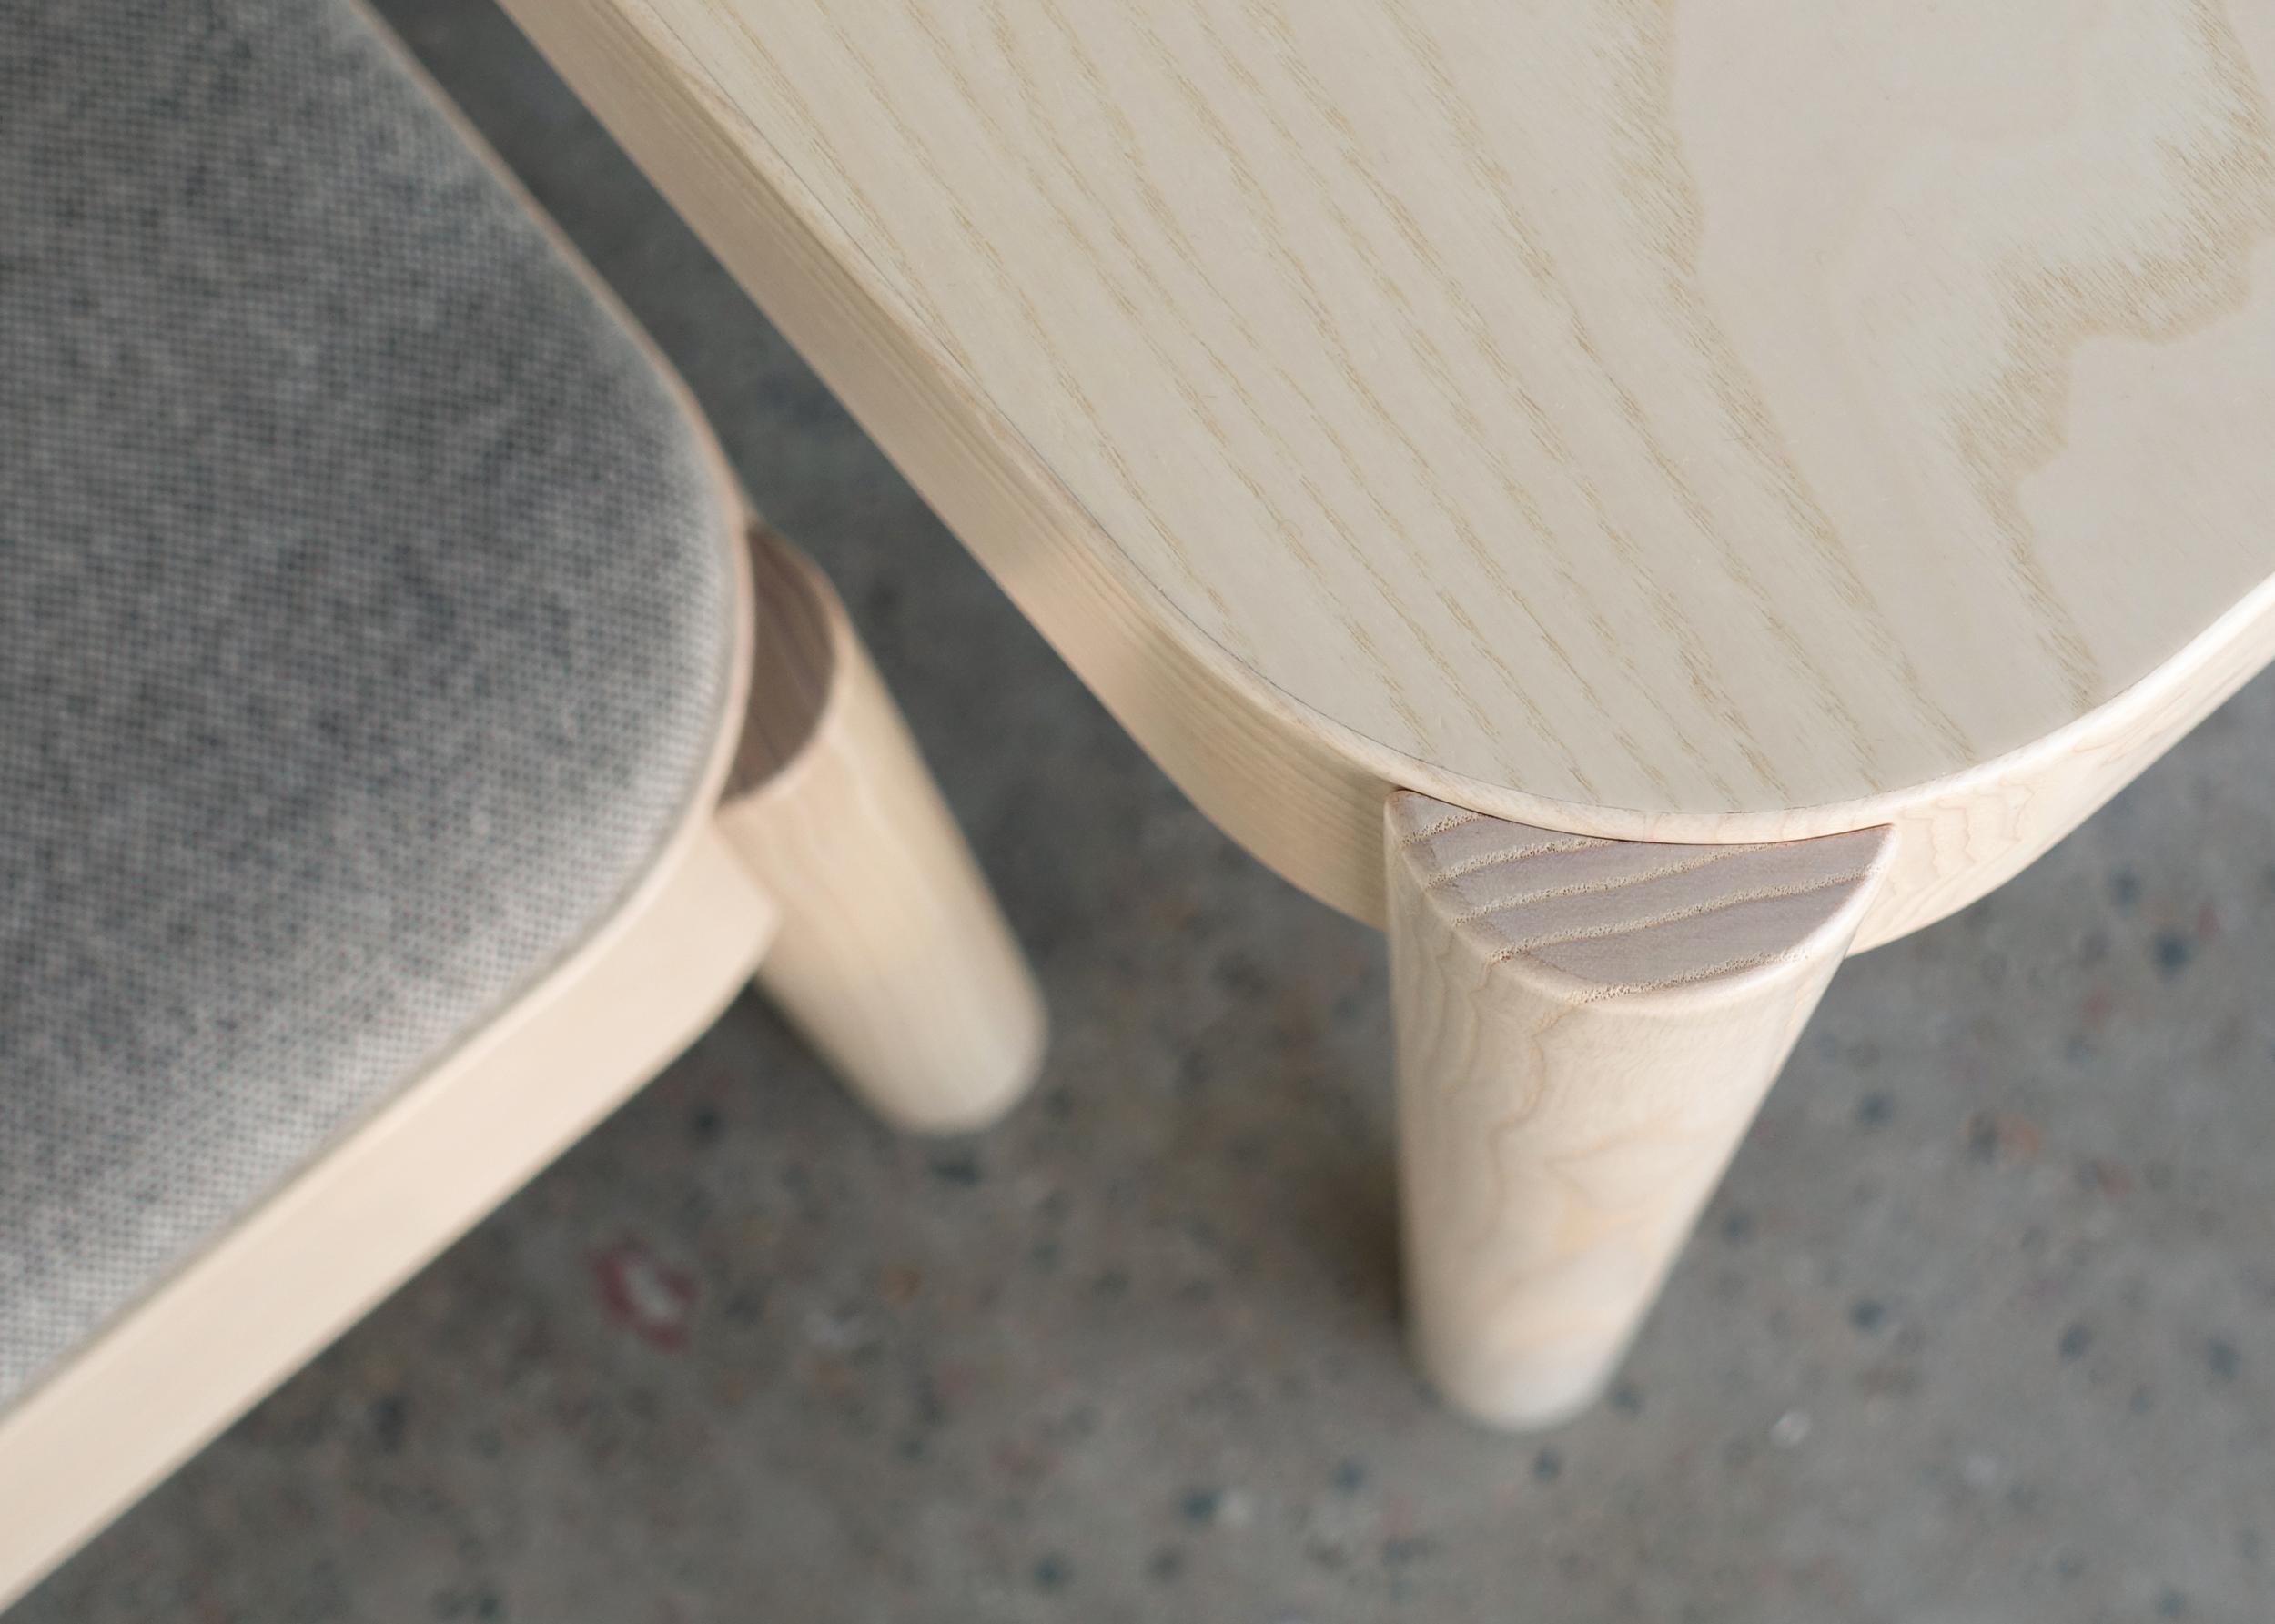 Wakufuru table and becnh, designed by Johan Kauppi for Glimakra of Sweden